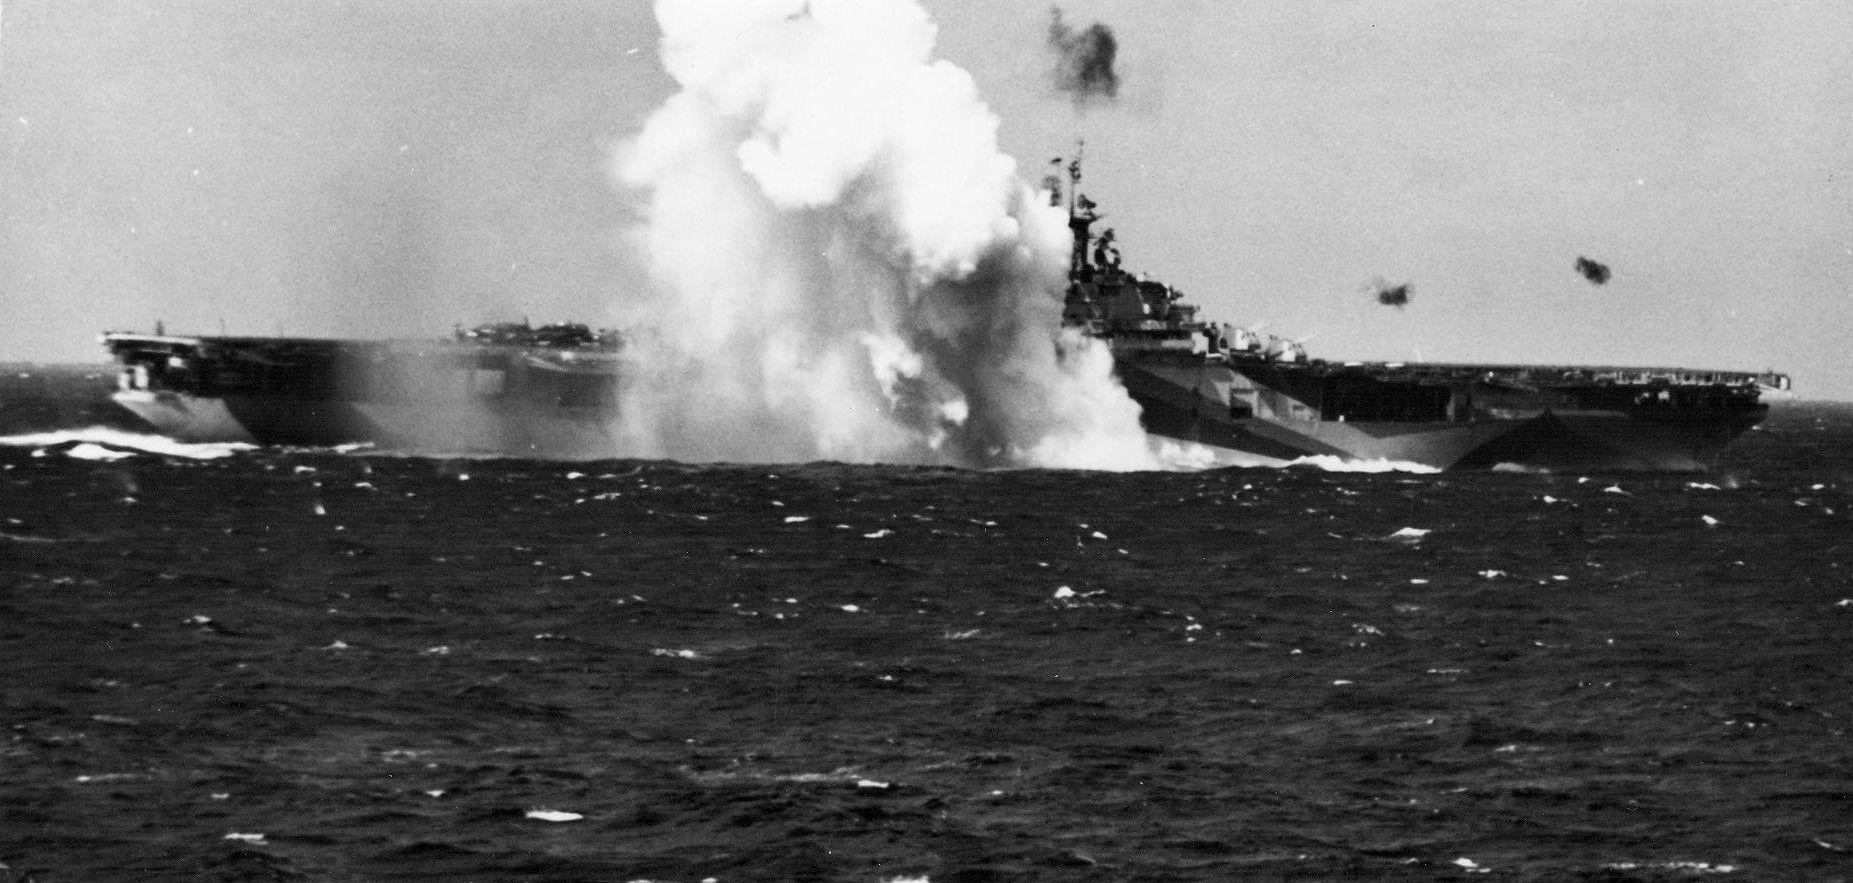 Kamikaze_crashes_near_USS_Ticonderoga_(CV-14)_1944.jpg (1853×883)